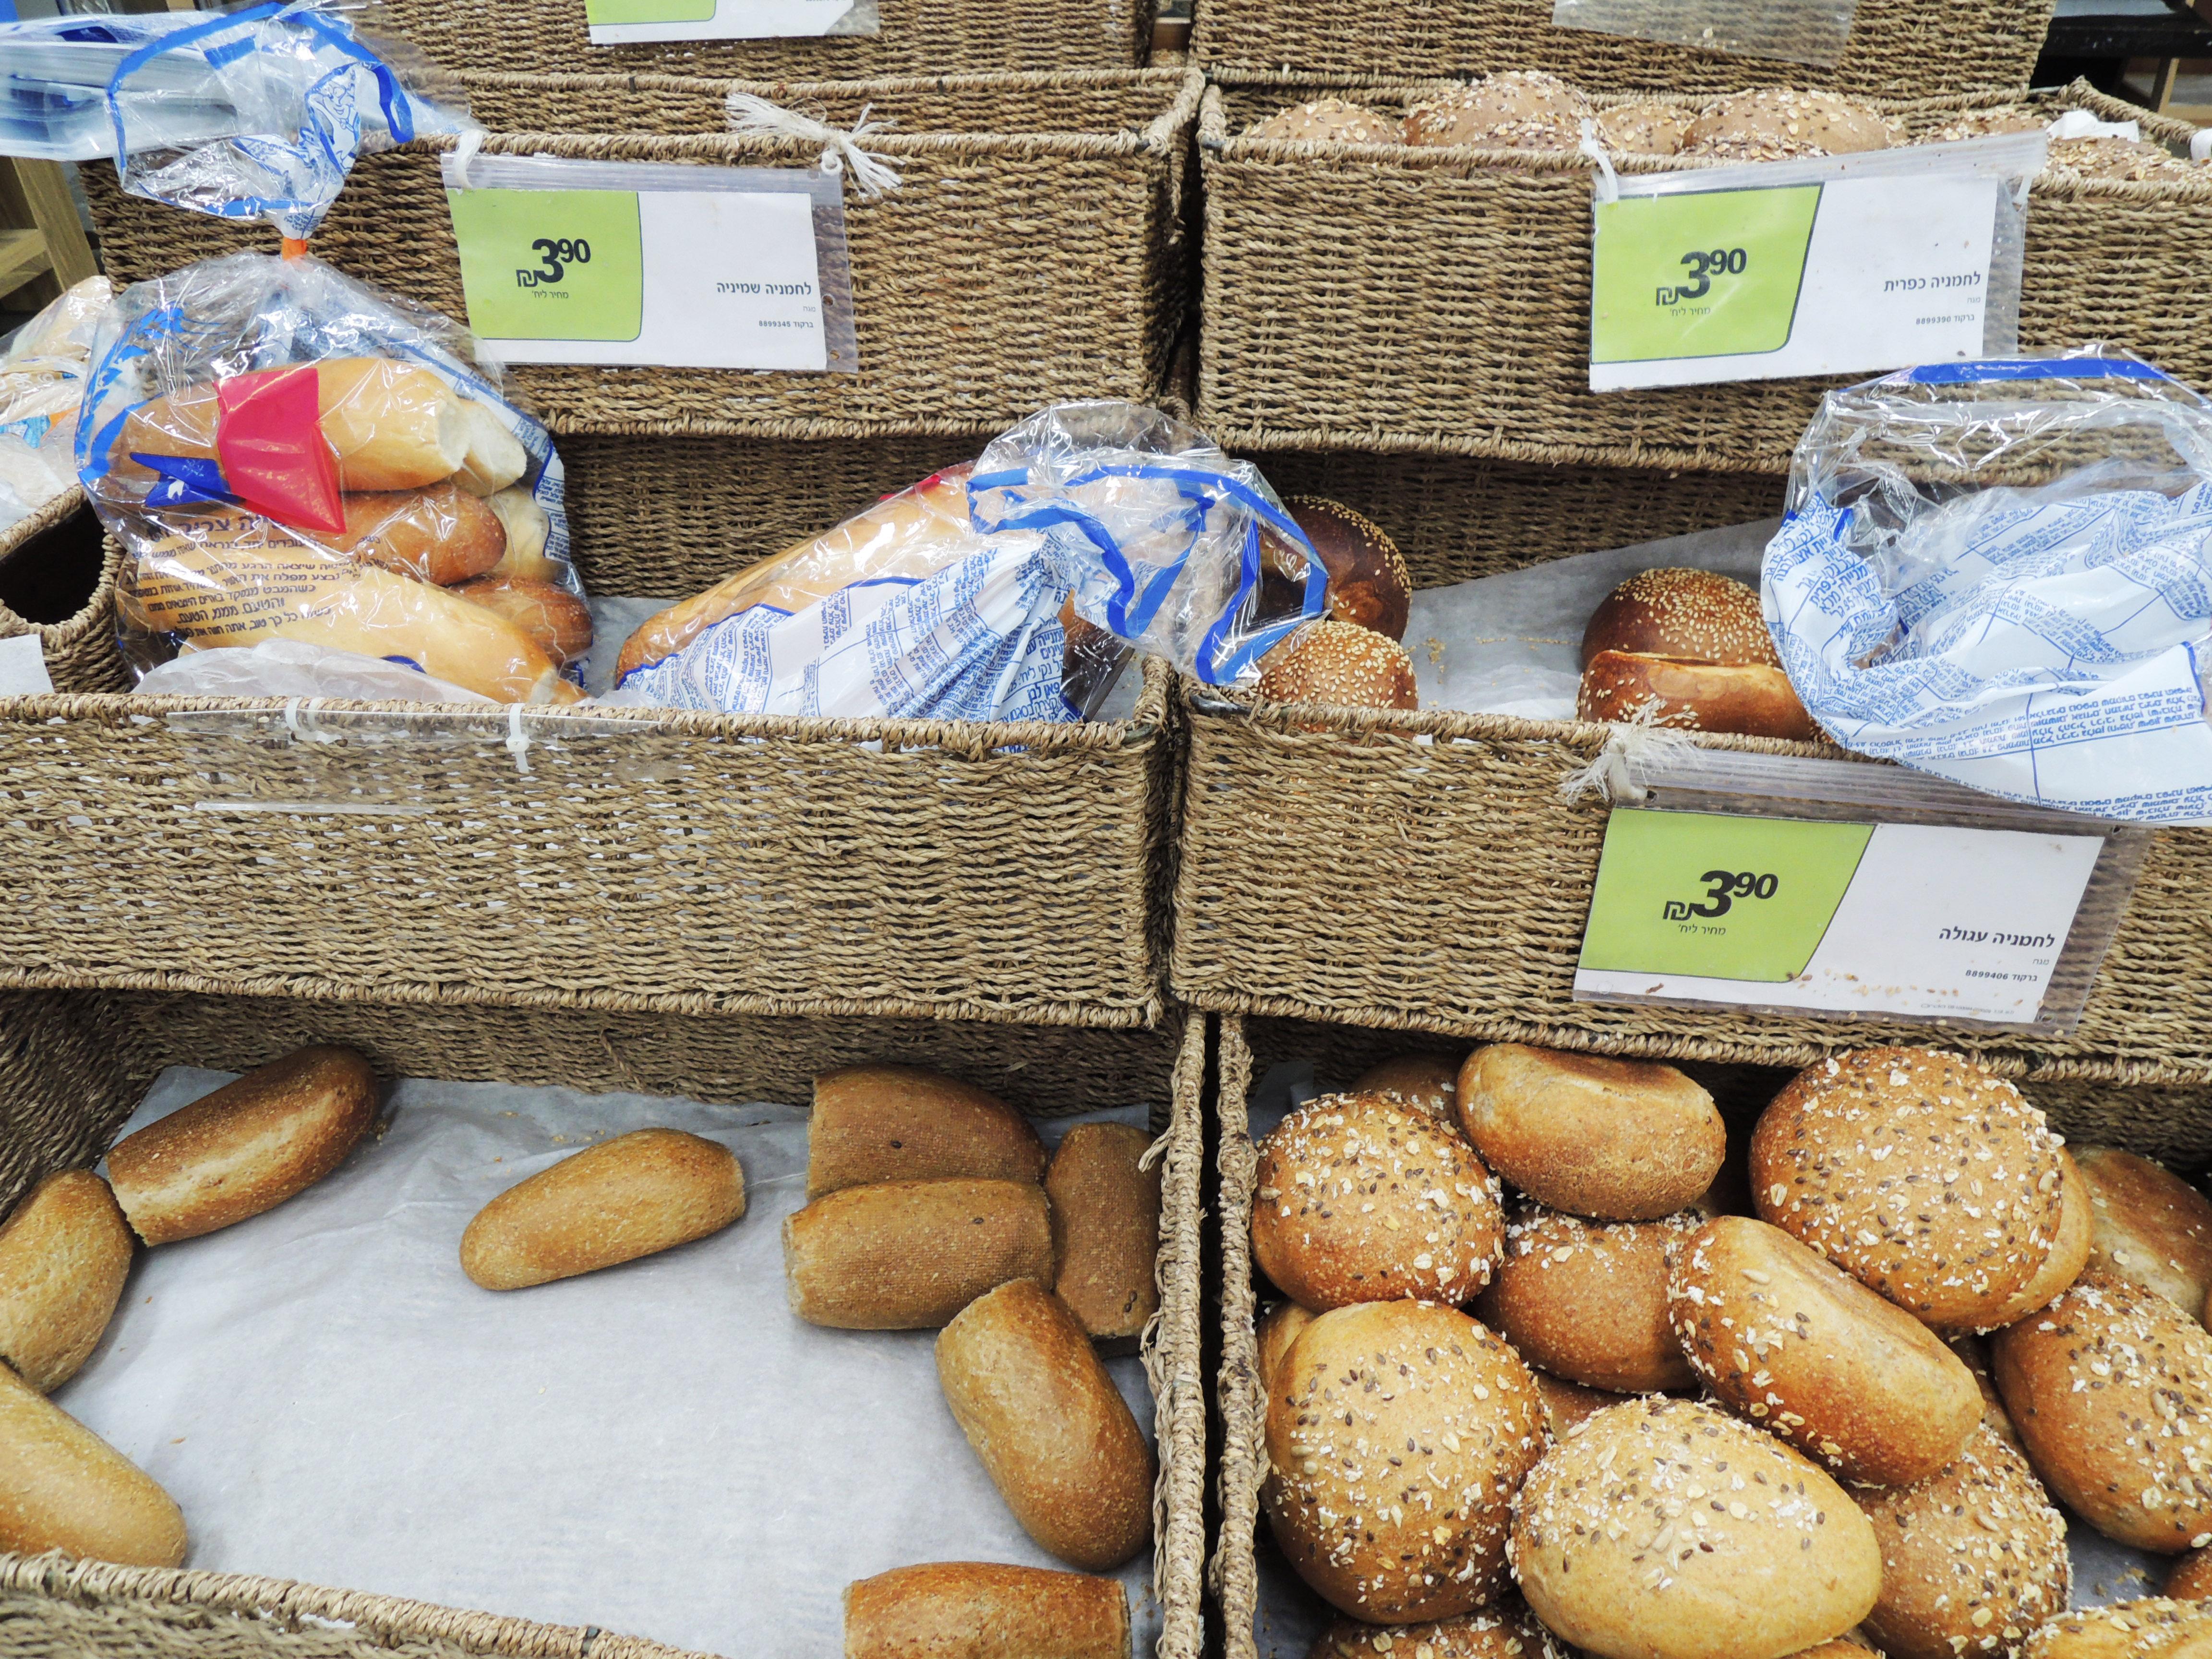 Tel Aviv: Supermarket